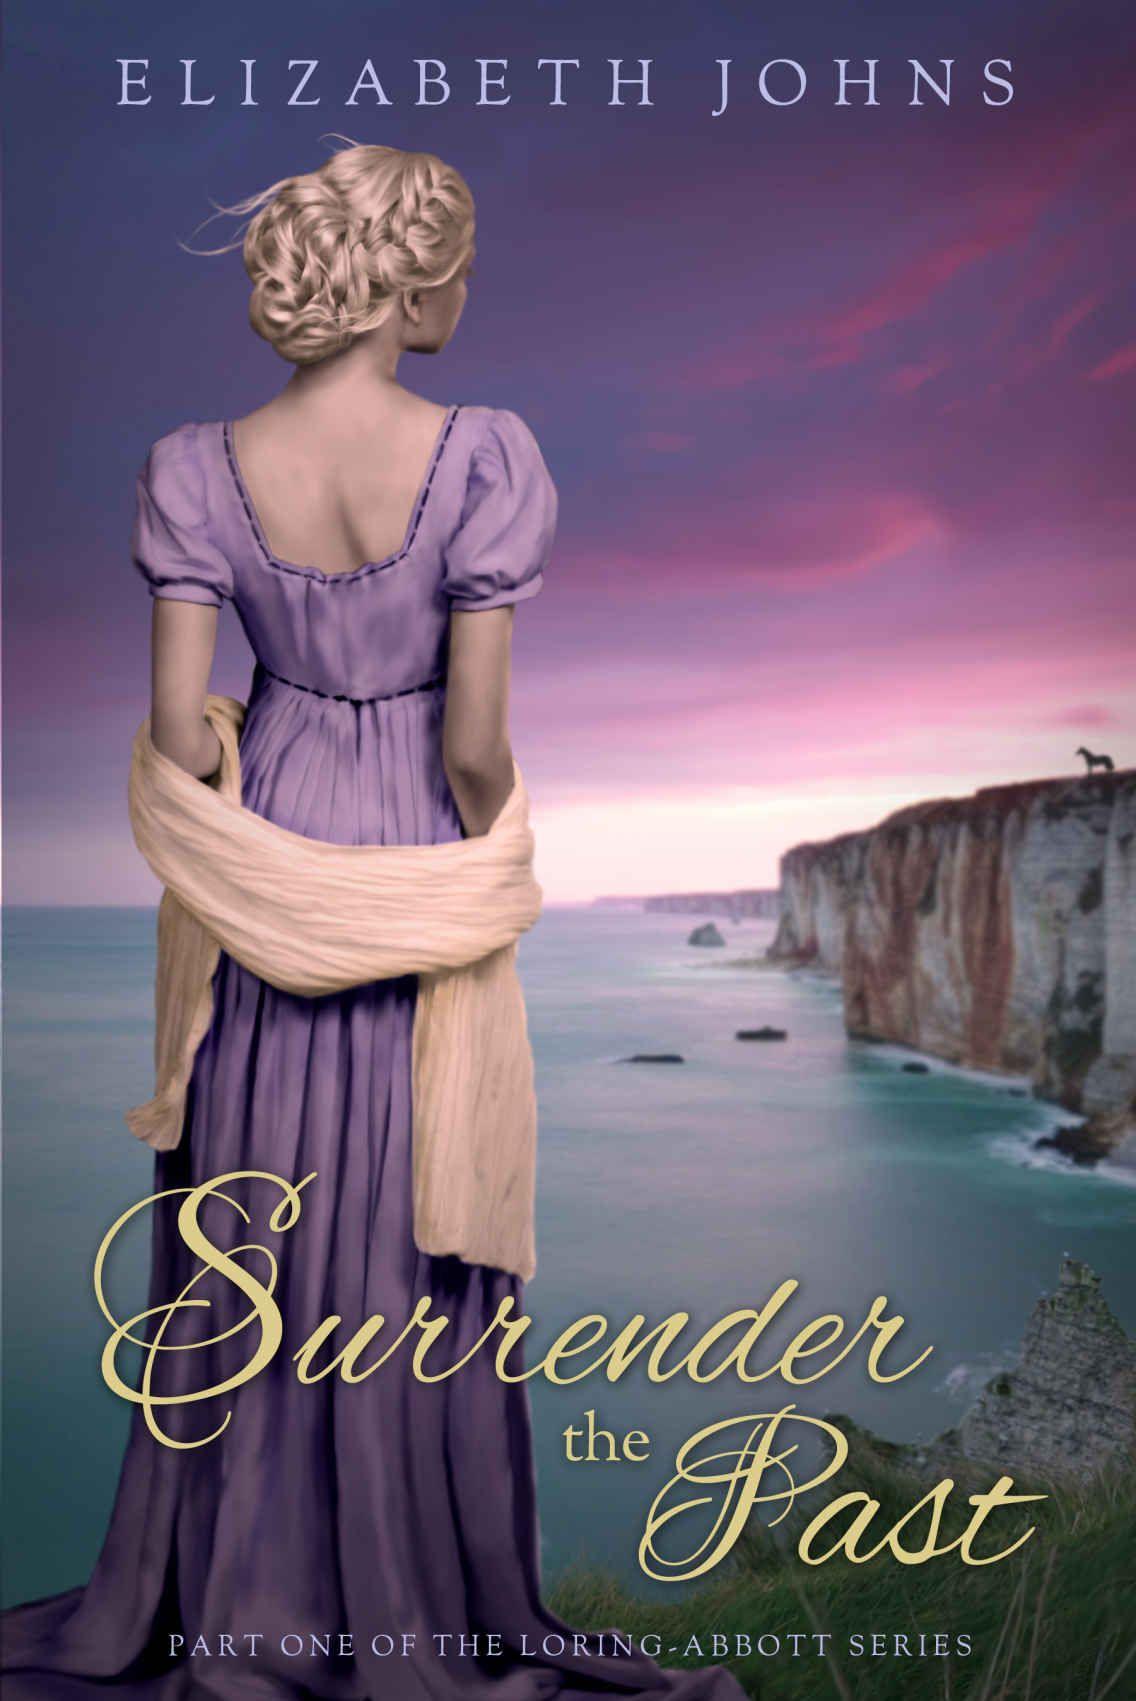 Surrender the Past: Traditional Regency Romance (Loring-Abbott Series Book 1) - Kindle edition by Elizabeth Johns. Literature & Fiction Kindle eBooks @ Amazon.com.